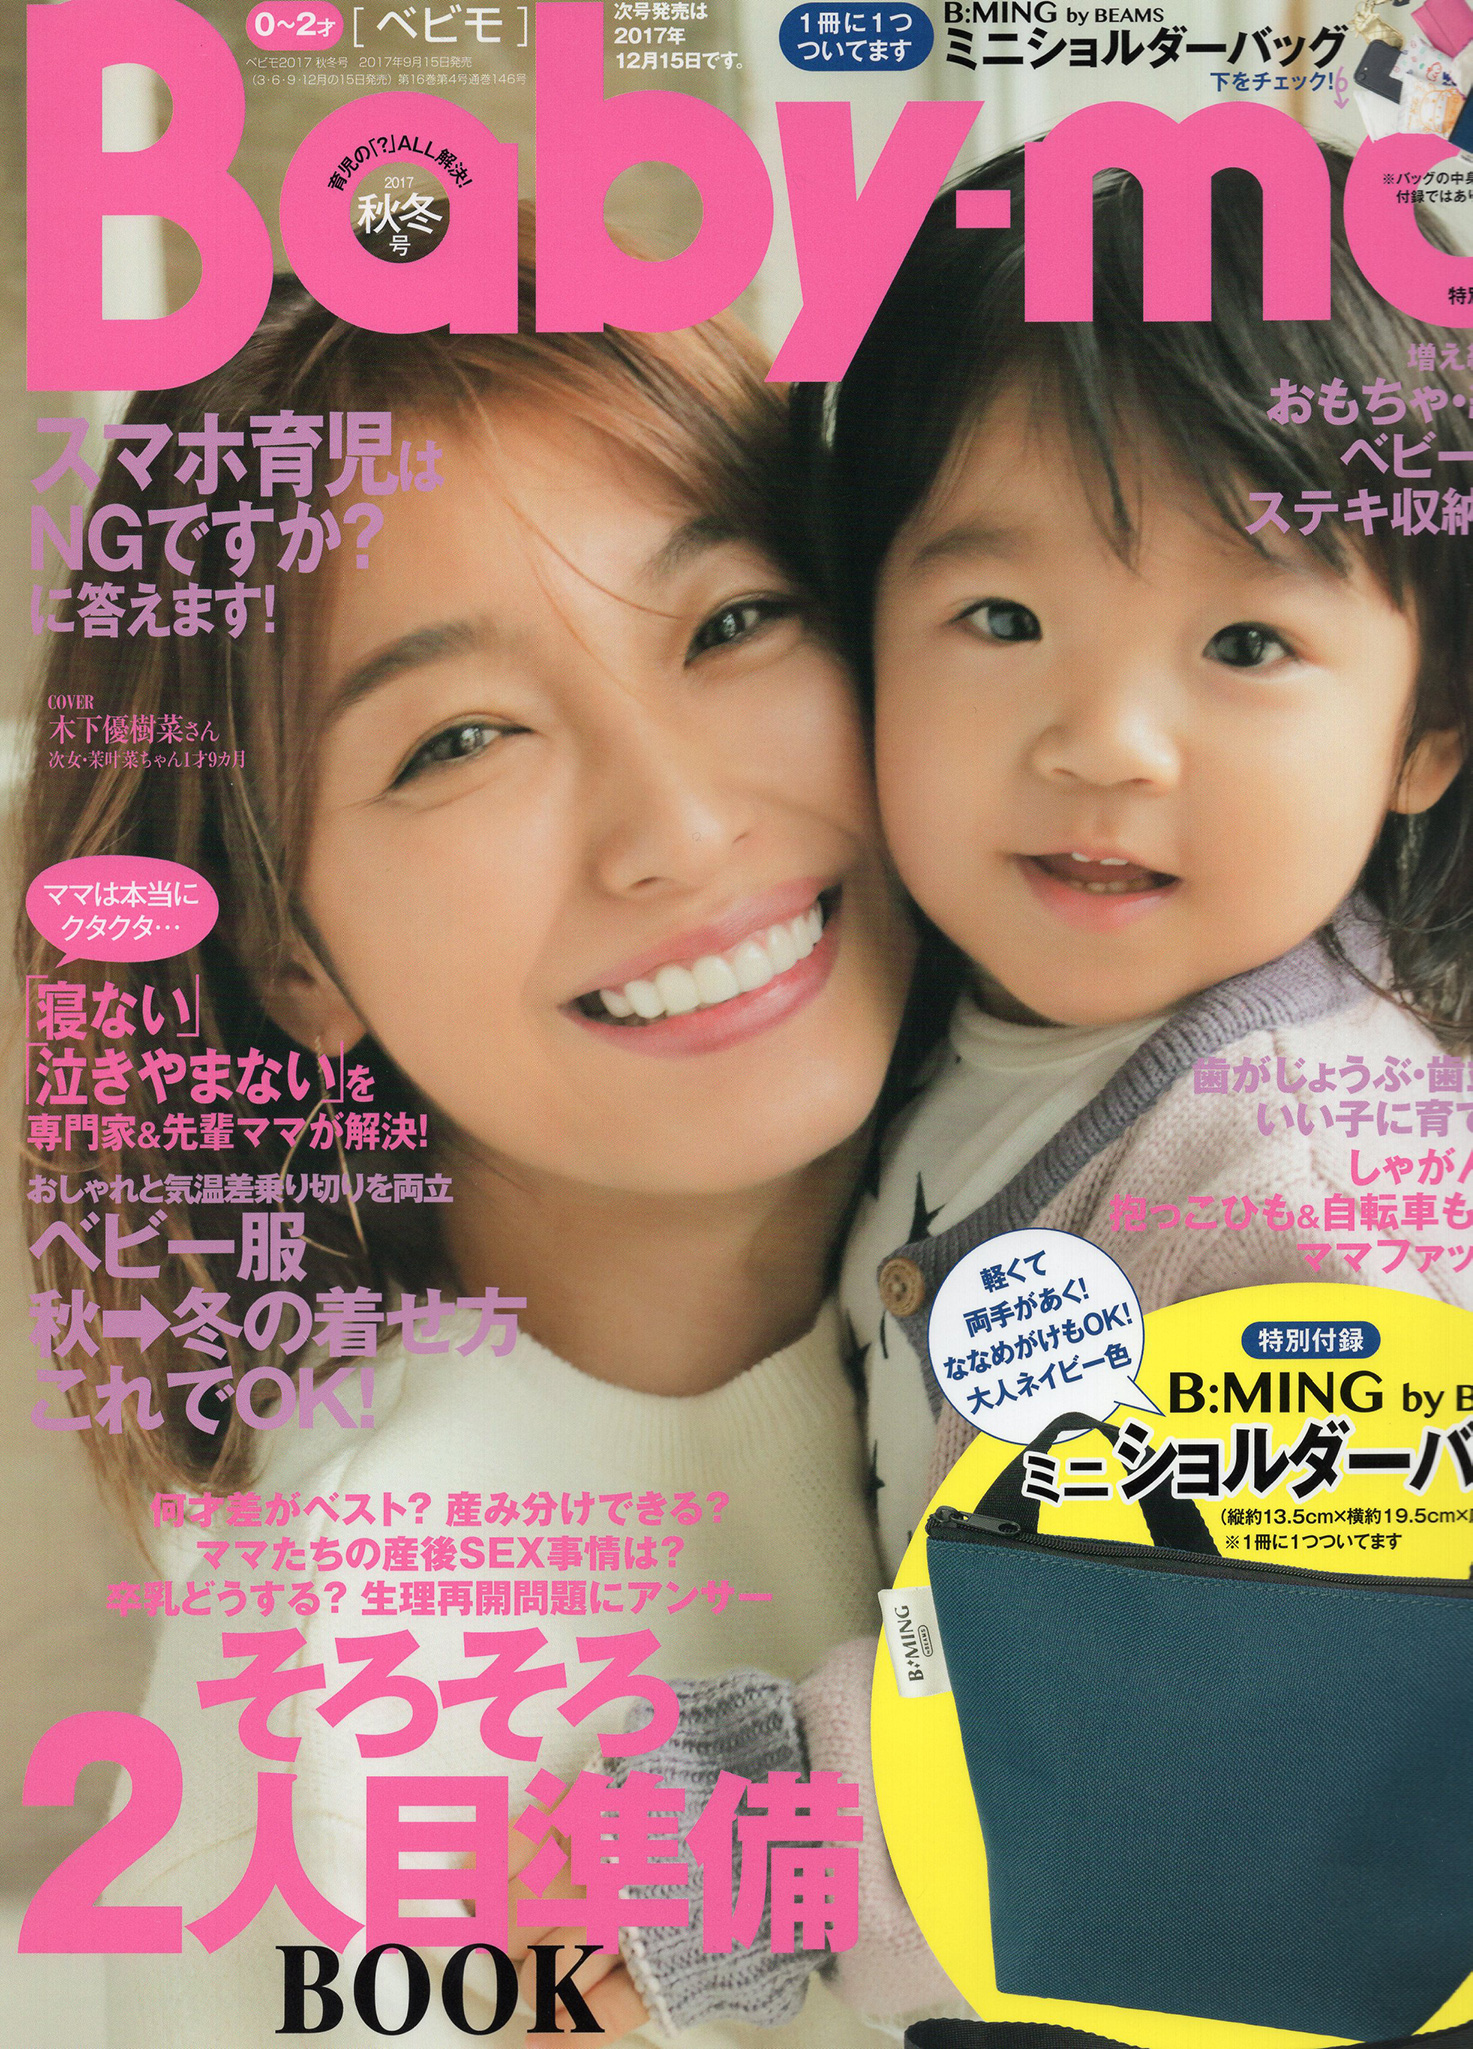 baby-mo 2017 木下優樹菜 表紙